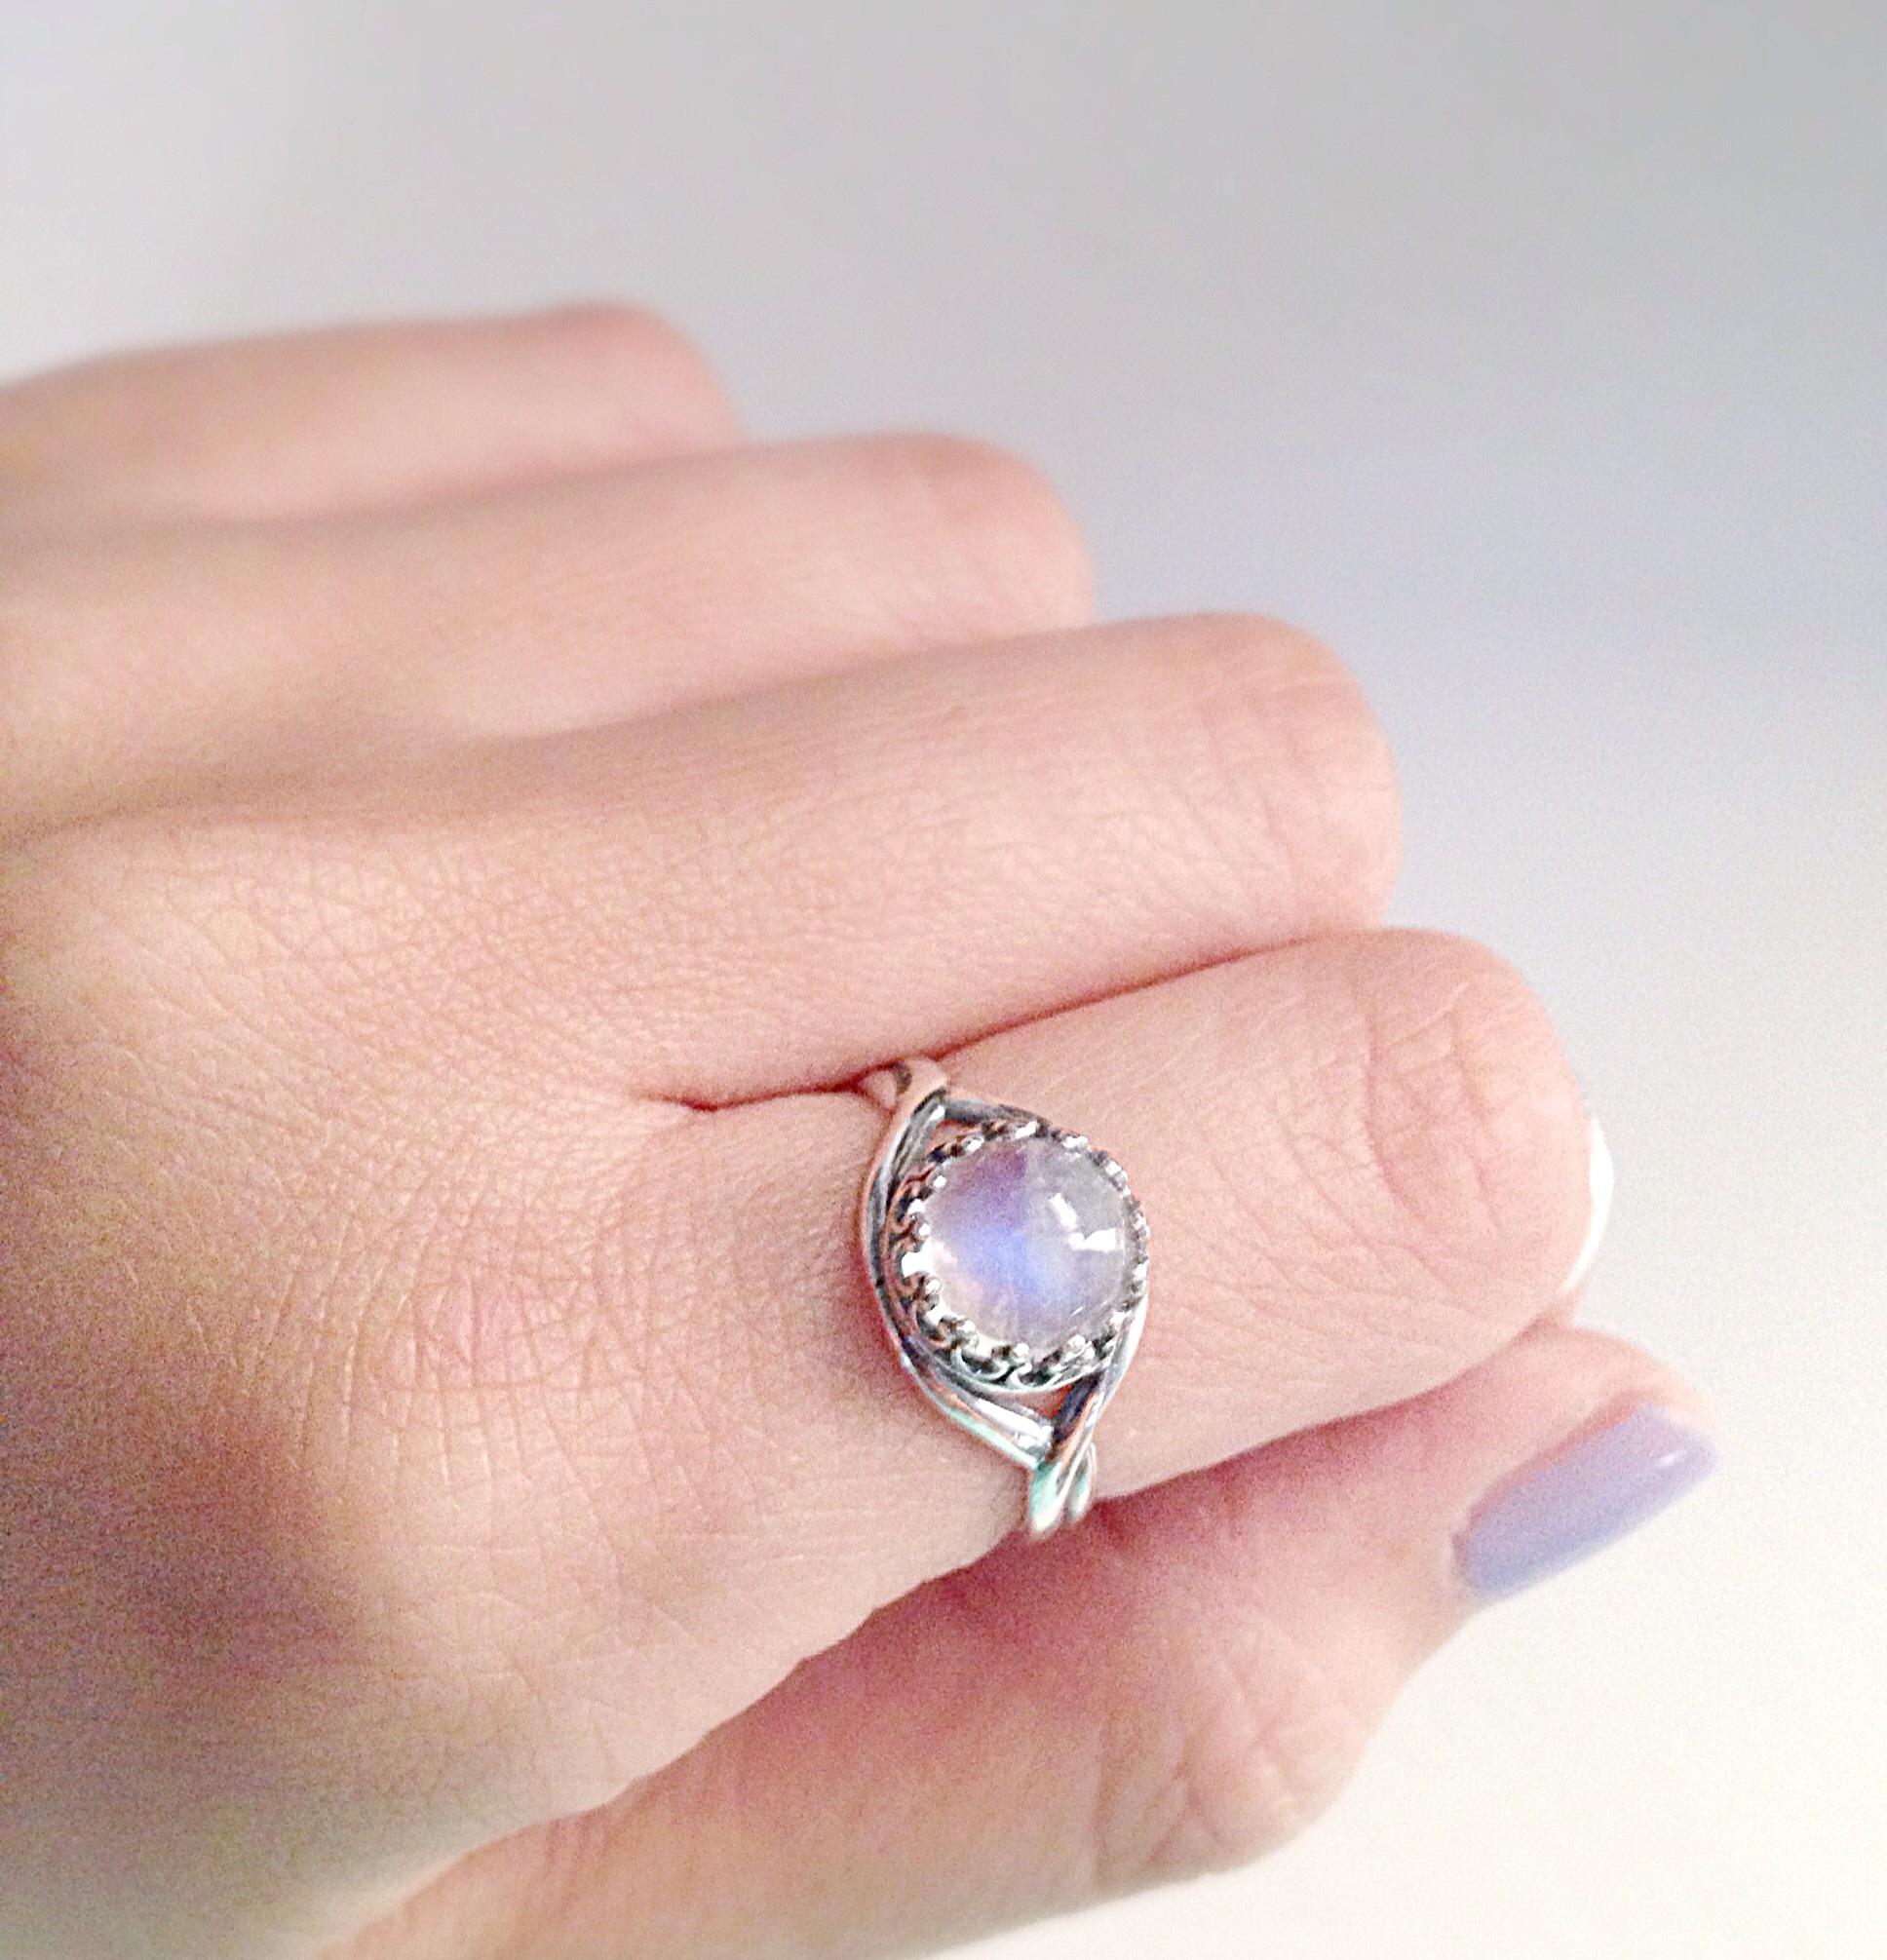 Mini Rainbow Moonstone · emily thai jewelry · Online Store Powered ...